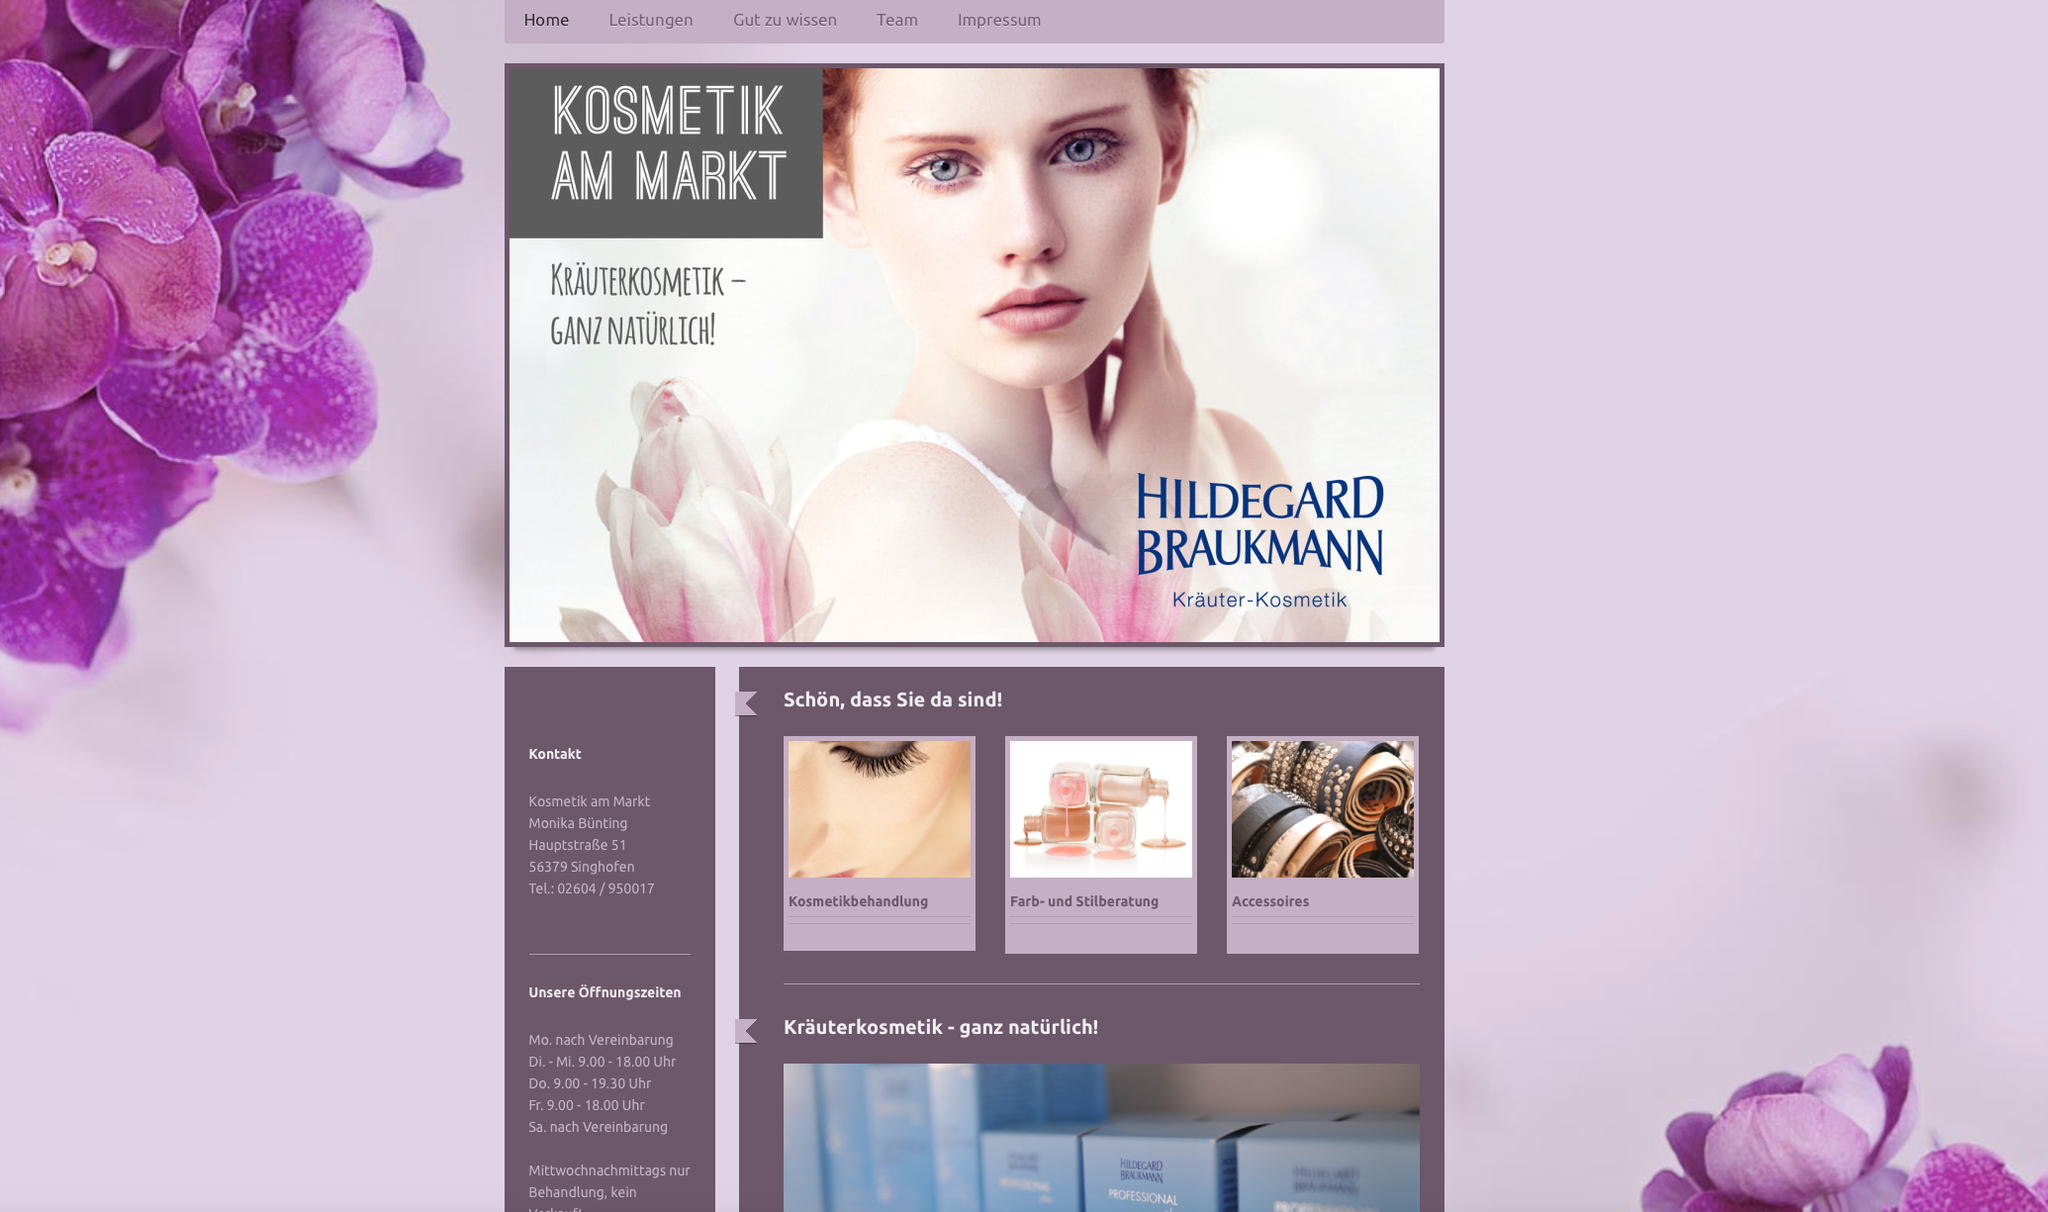 www.kosmetik-monika-buenting.de